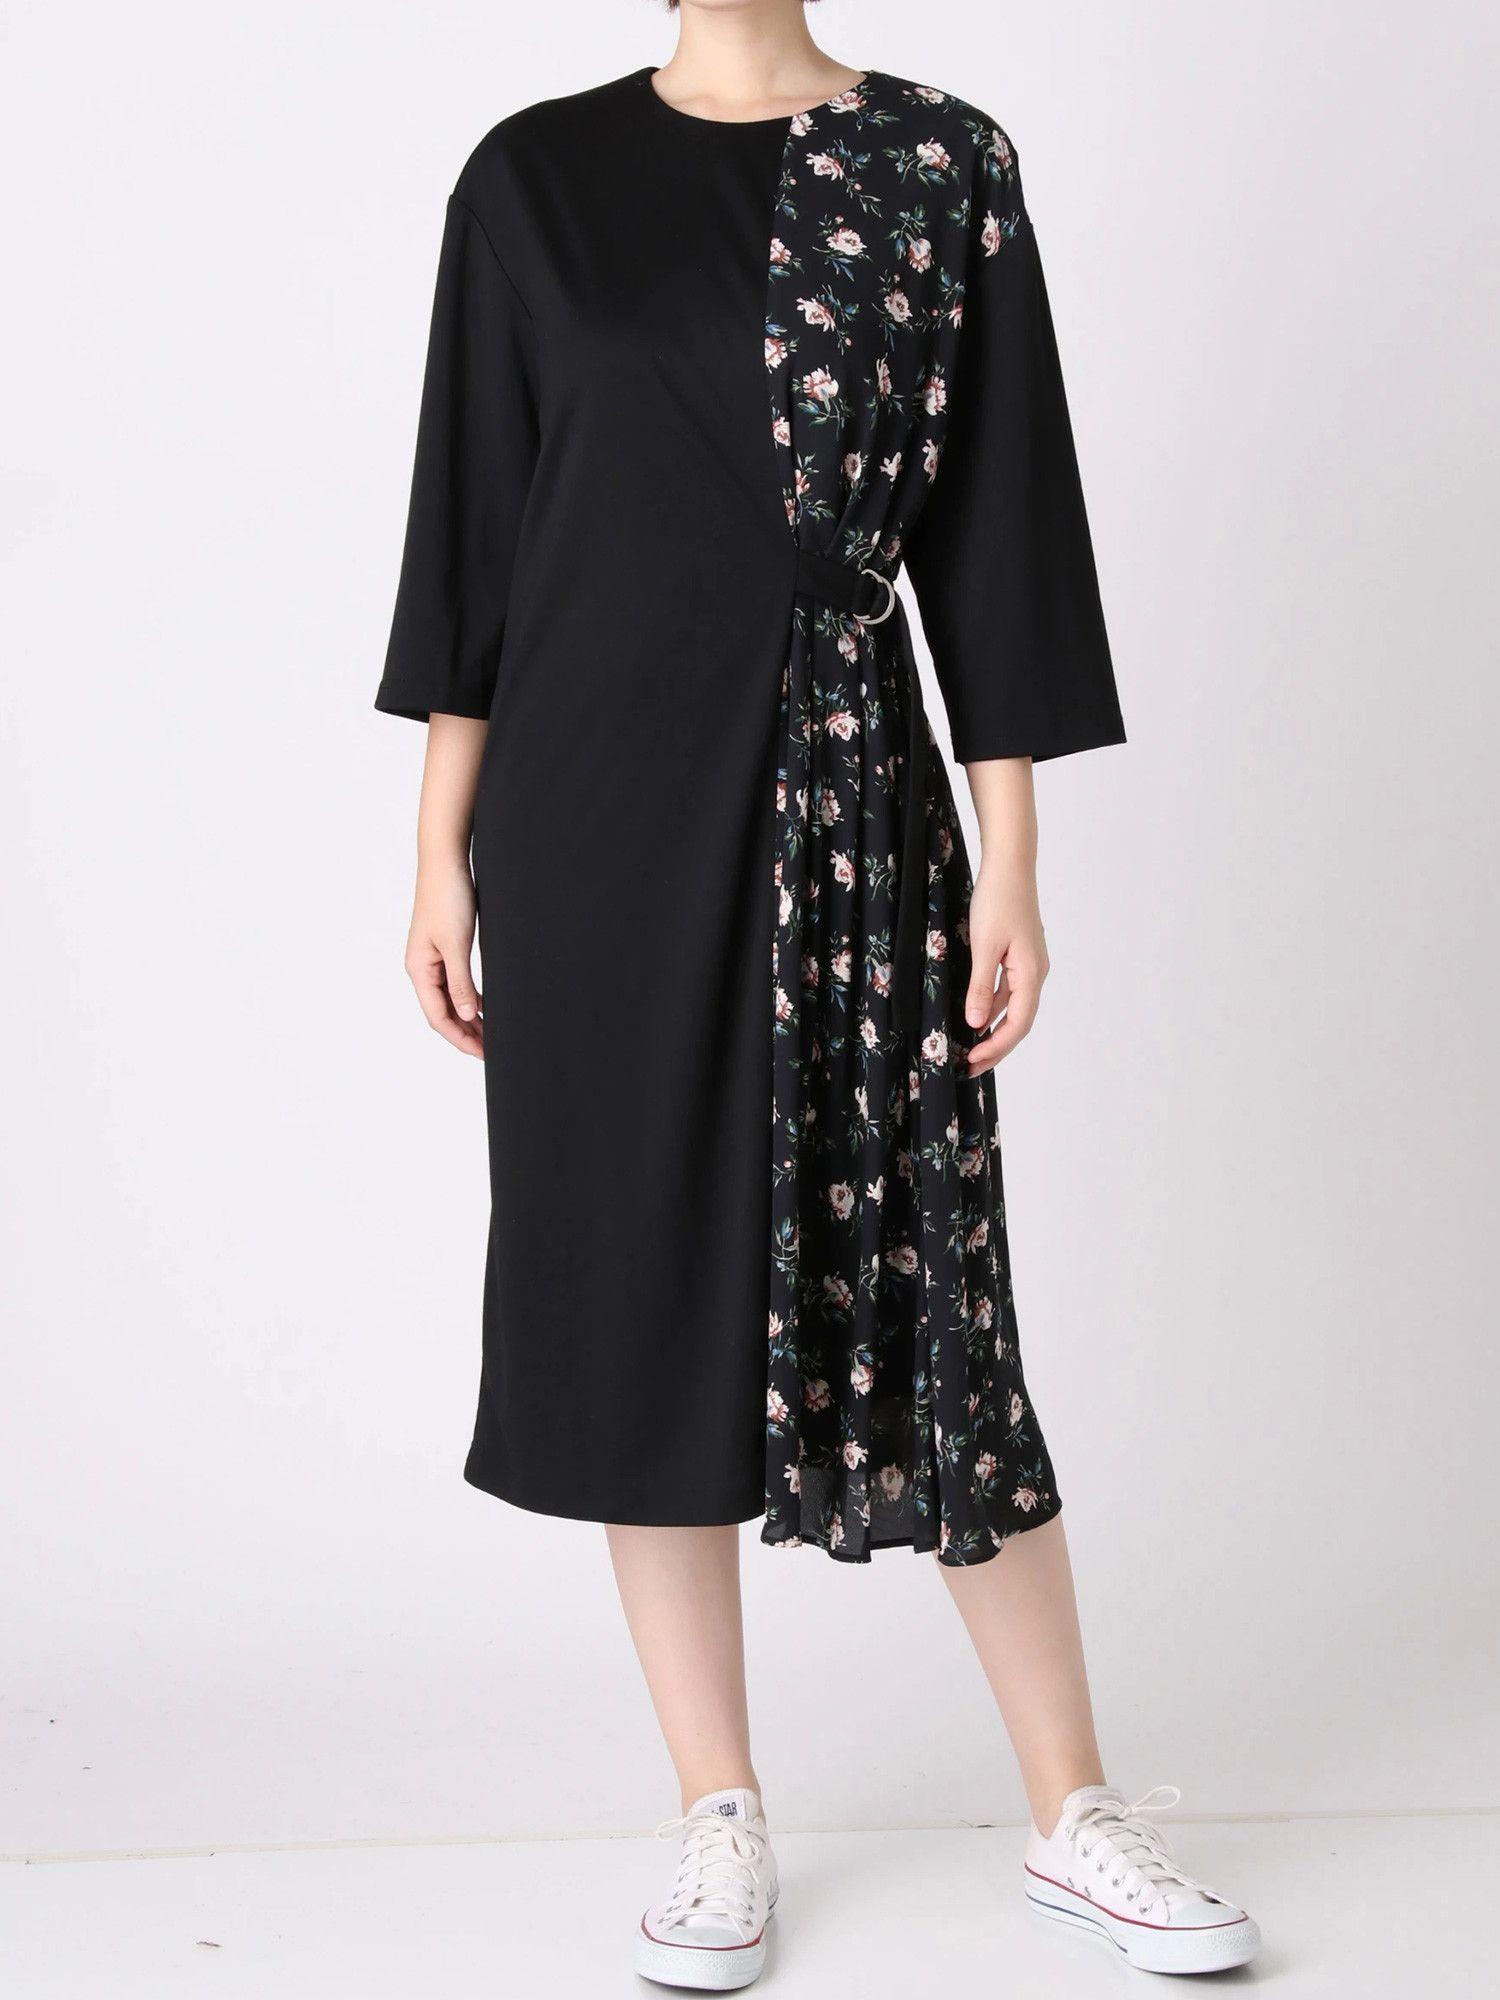 Flower Layered-style dress